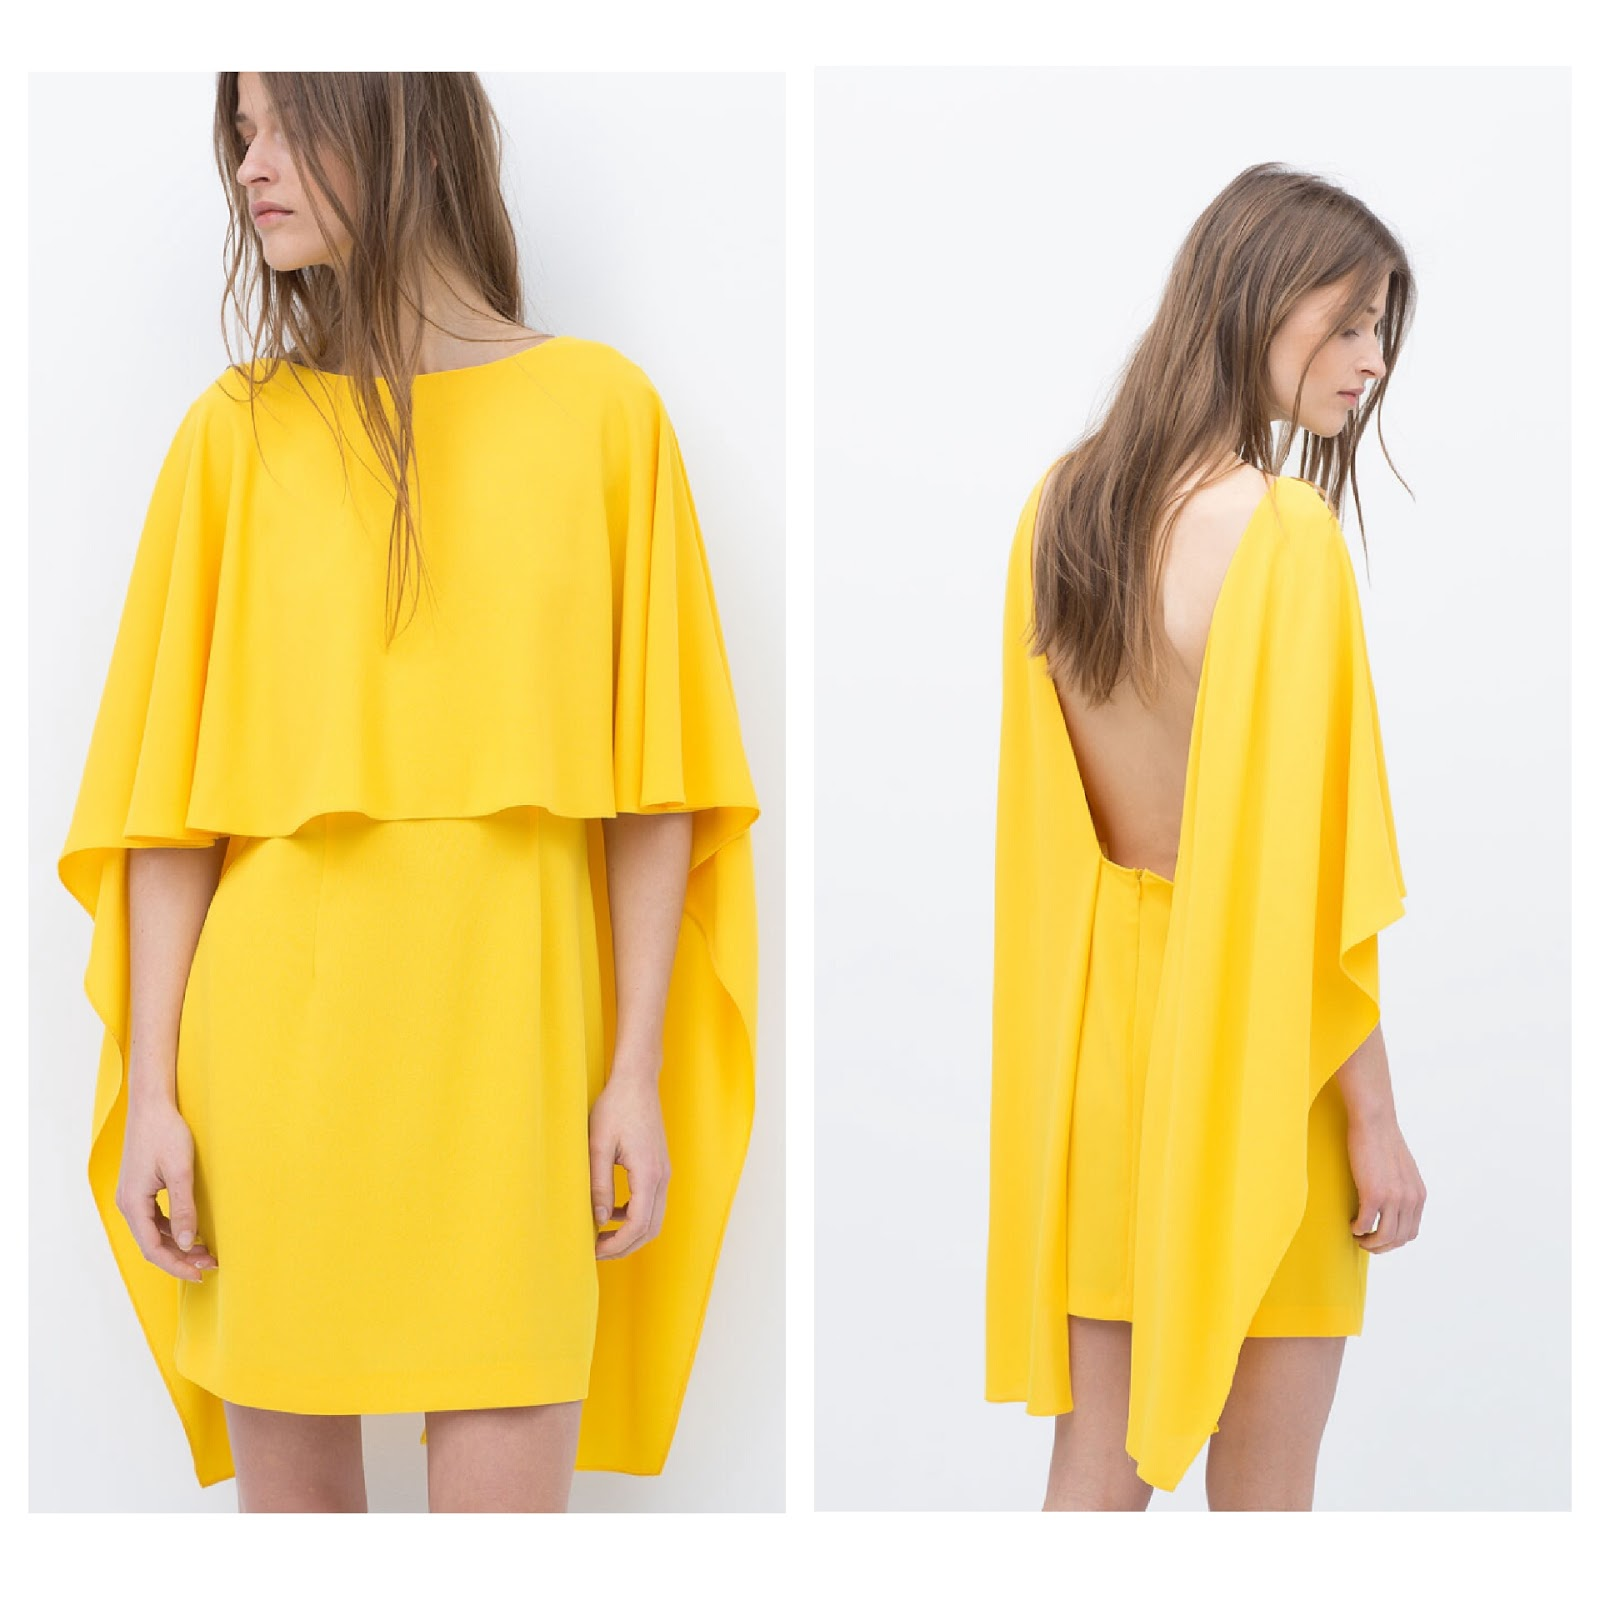 Zara Yellow Cape Dress Just The F Word